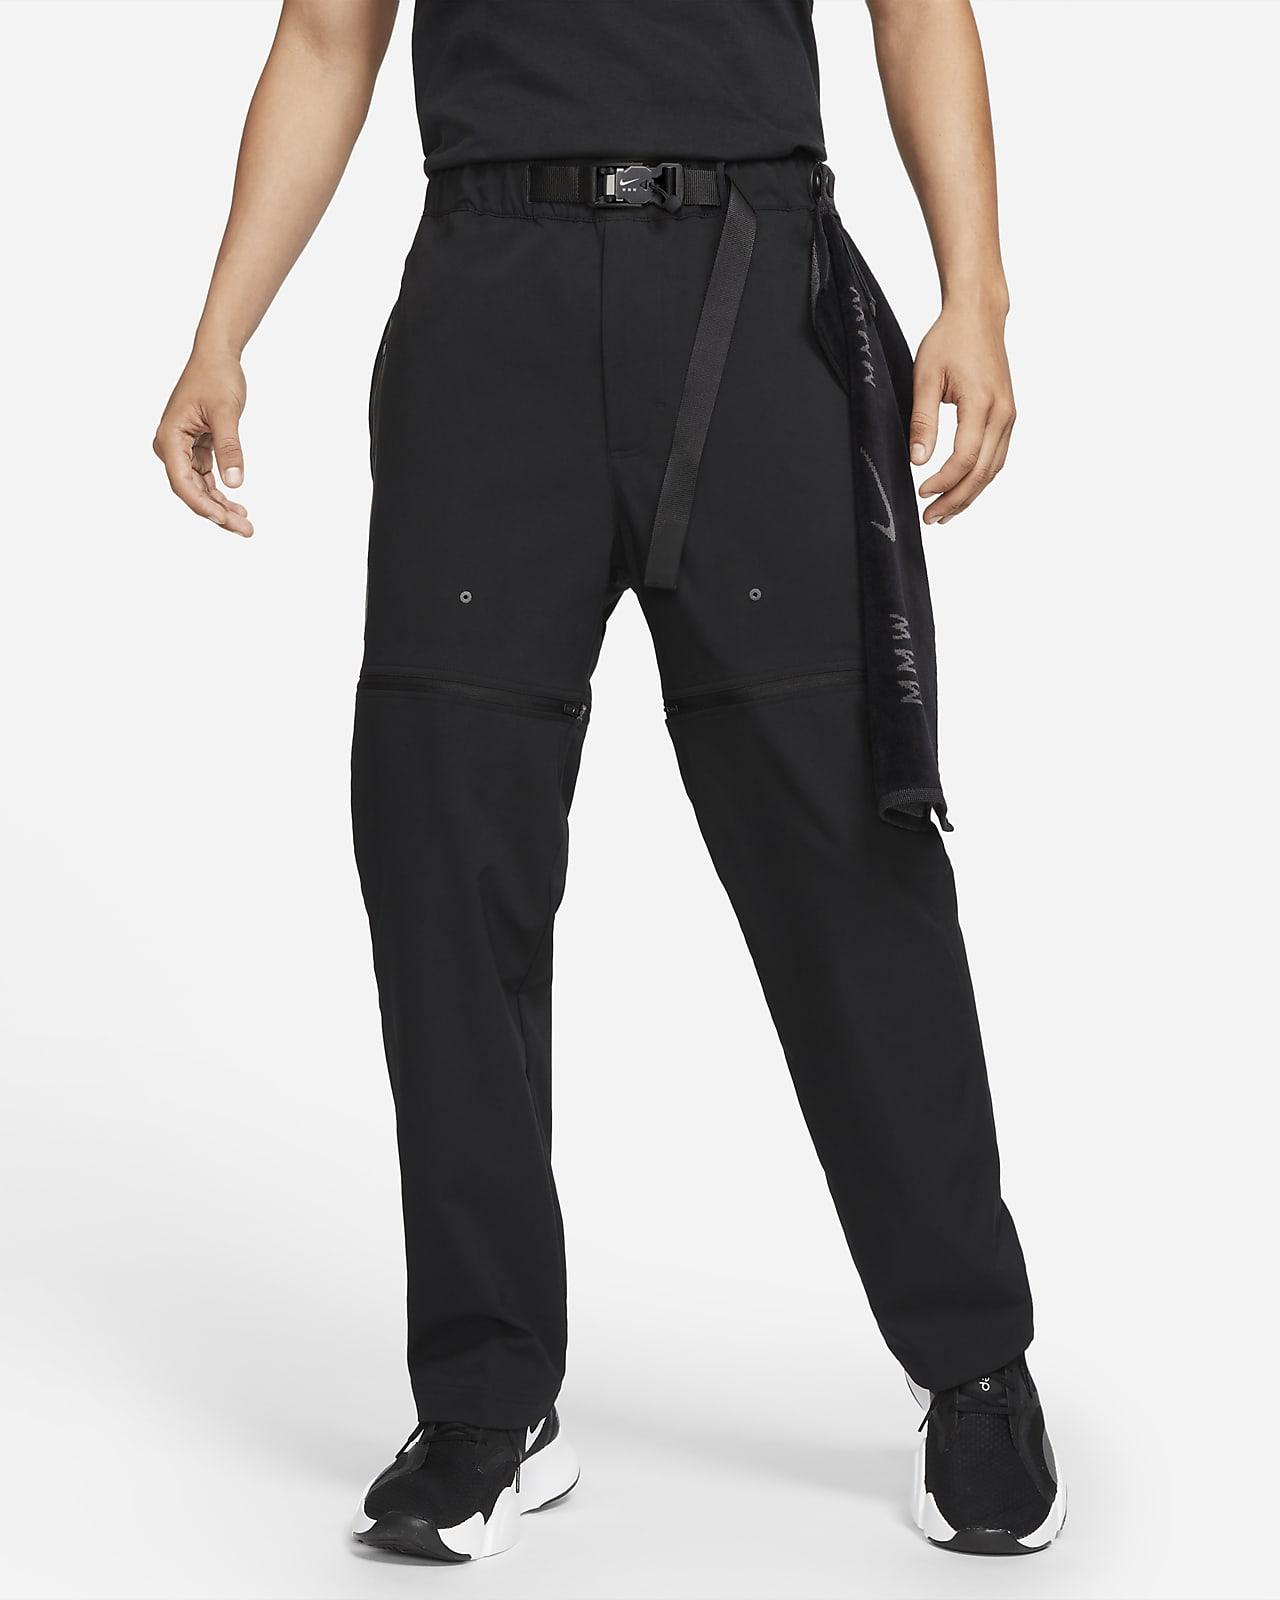 Nike x MMW 3-In-1 Convertible Trousers